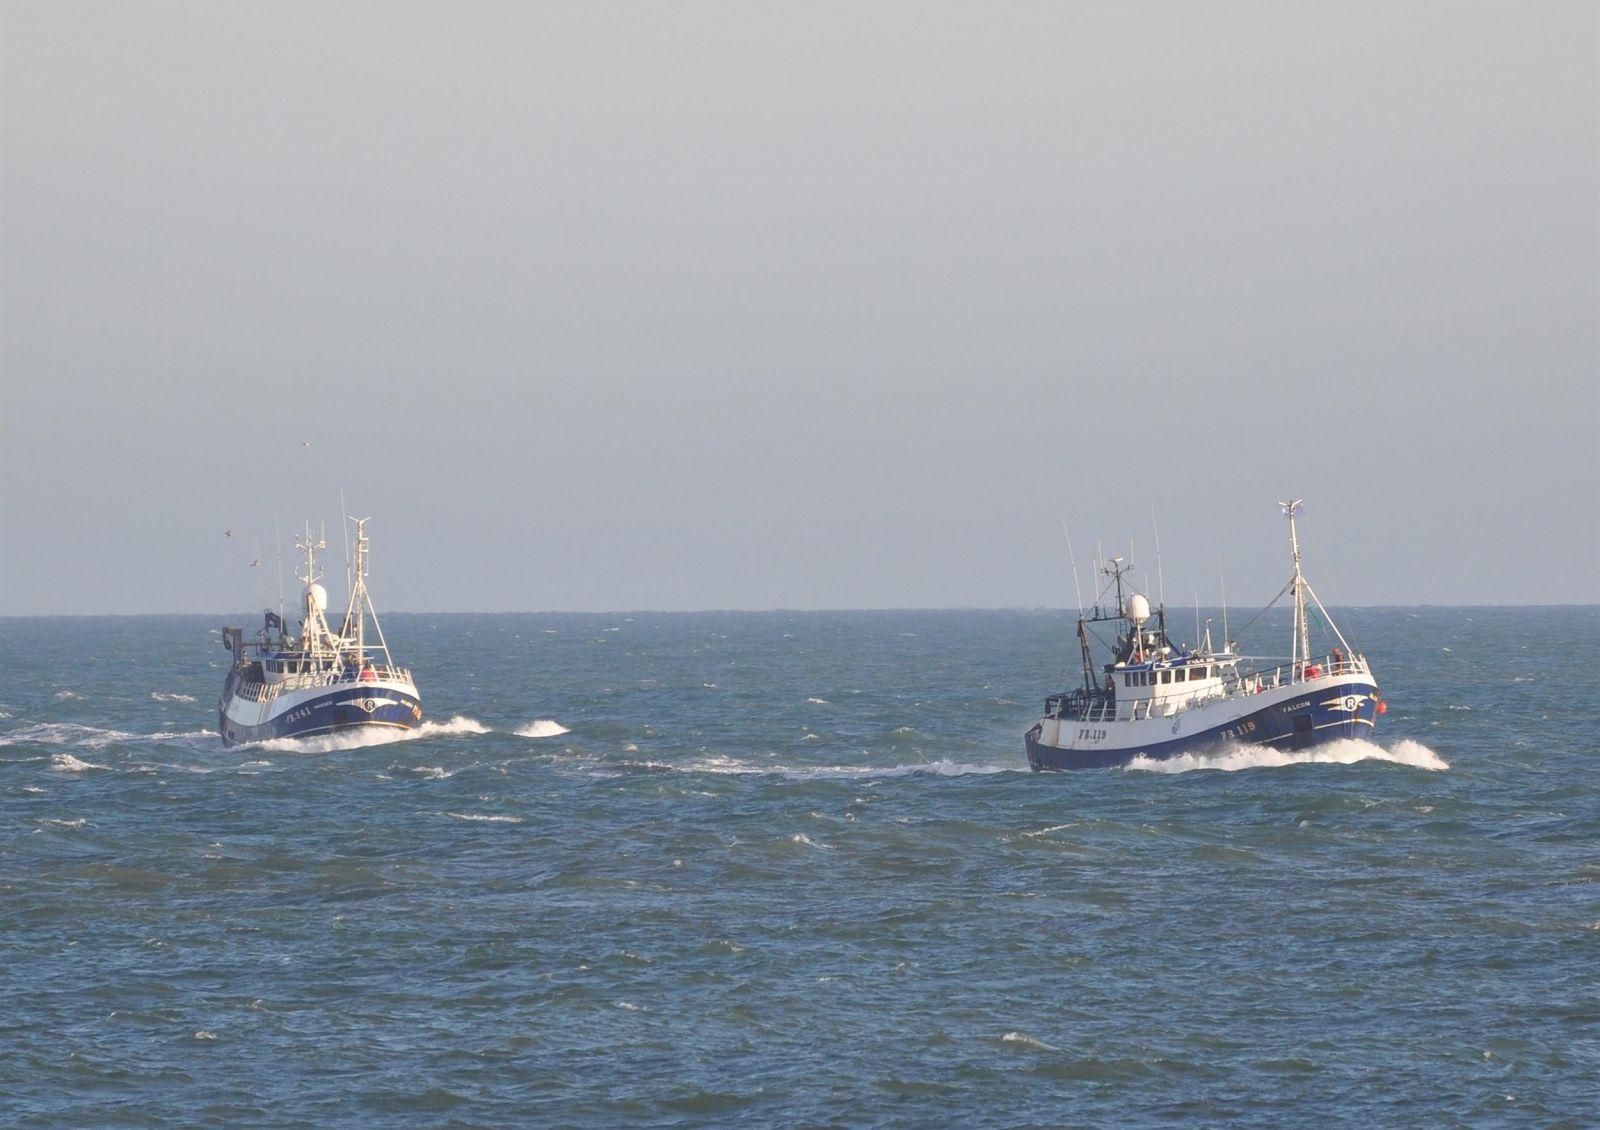 Phoenix  FR 941 and Falcon FR 119